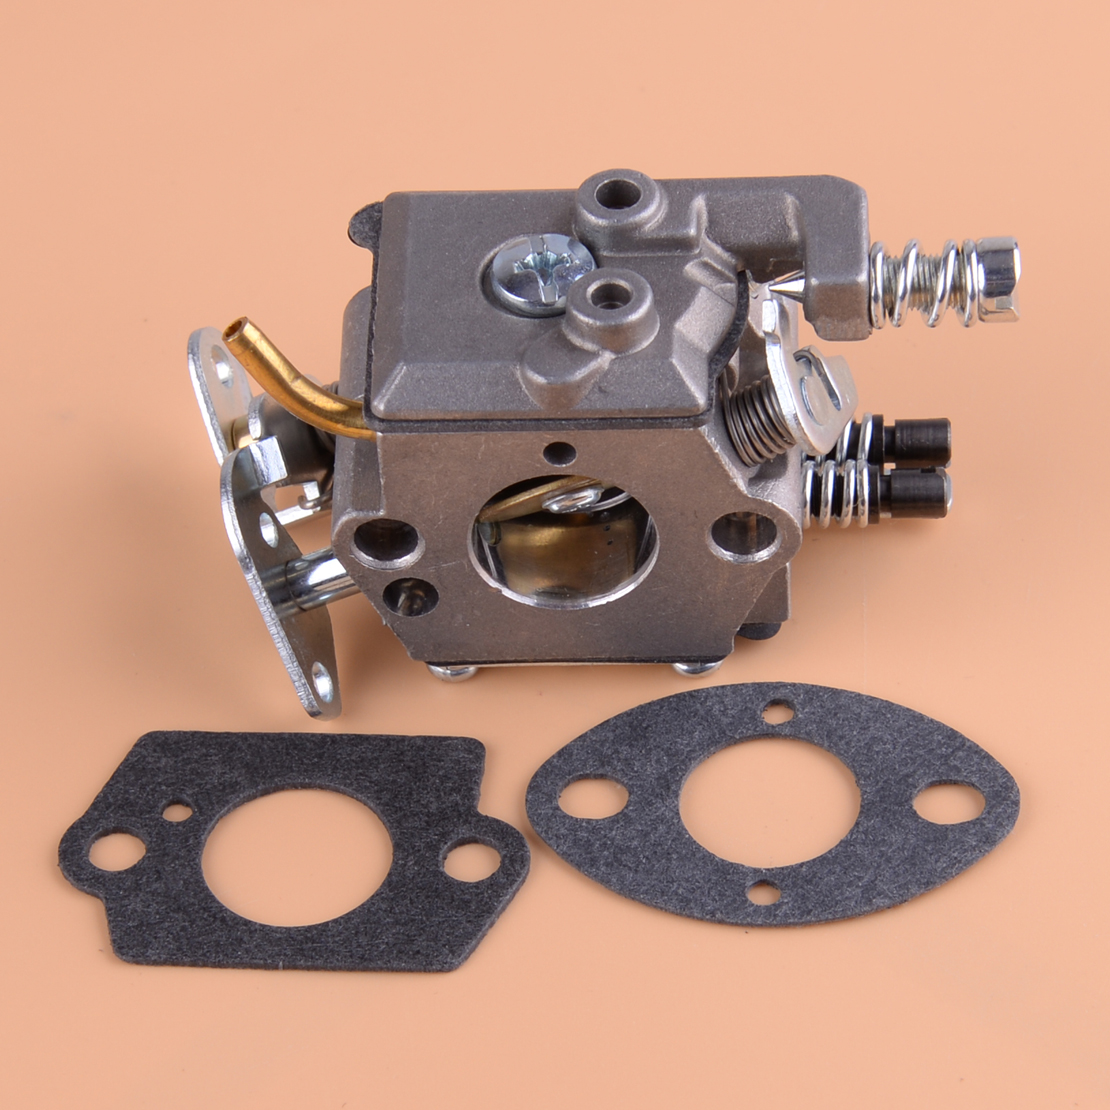 LETAOSK carburador Carb Kit 530071987 530019172 530035482 para Husqvarna 36 41 136 137 137e 141 142 motosierra Zama C1Q-W29E